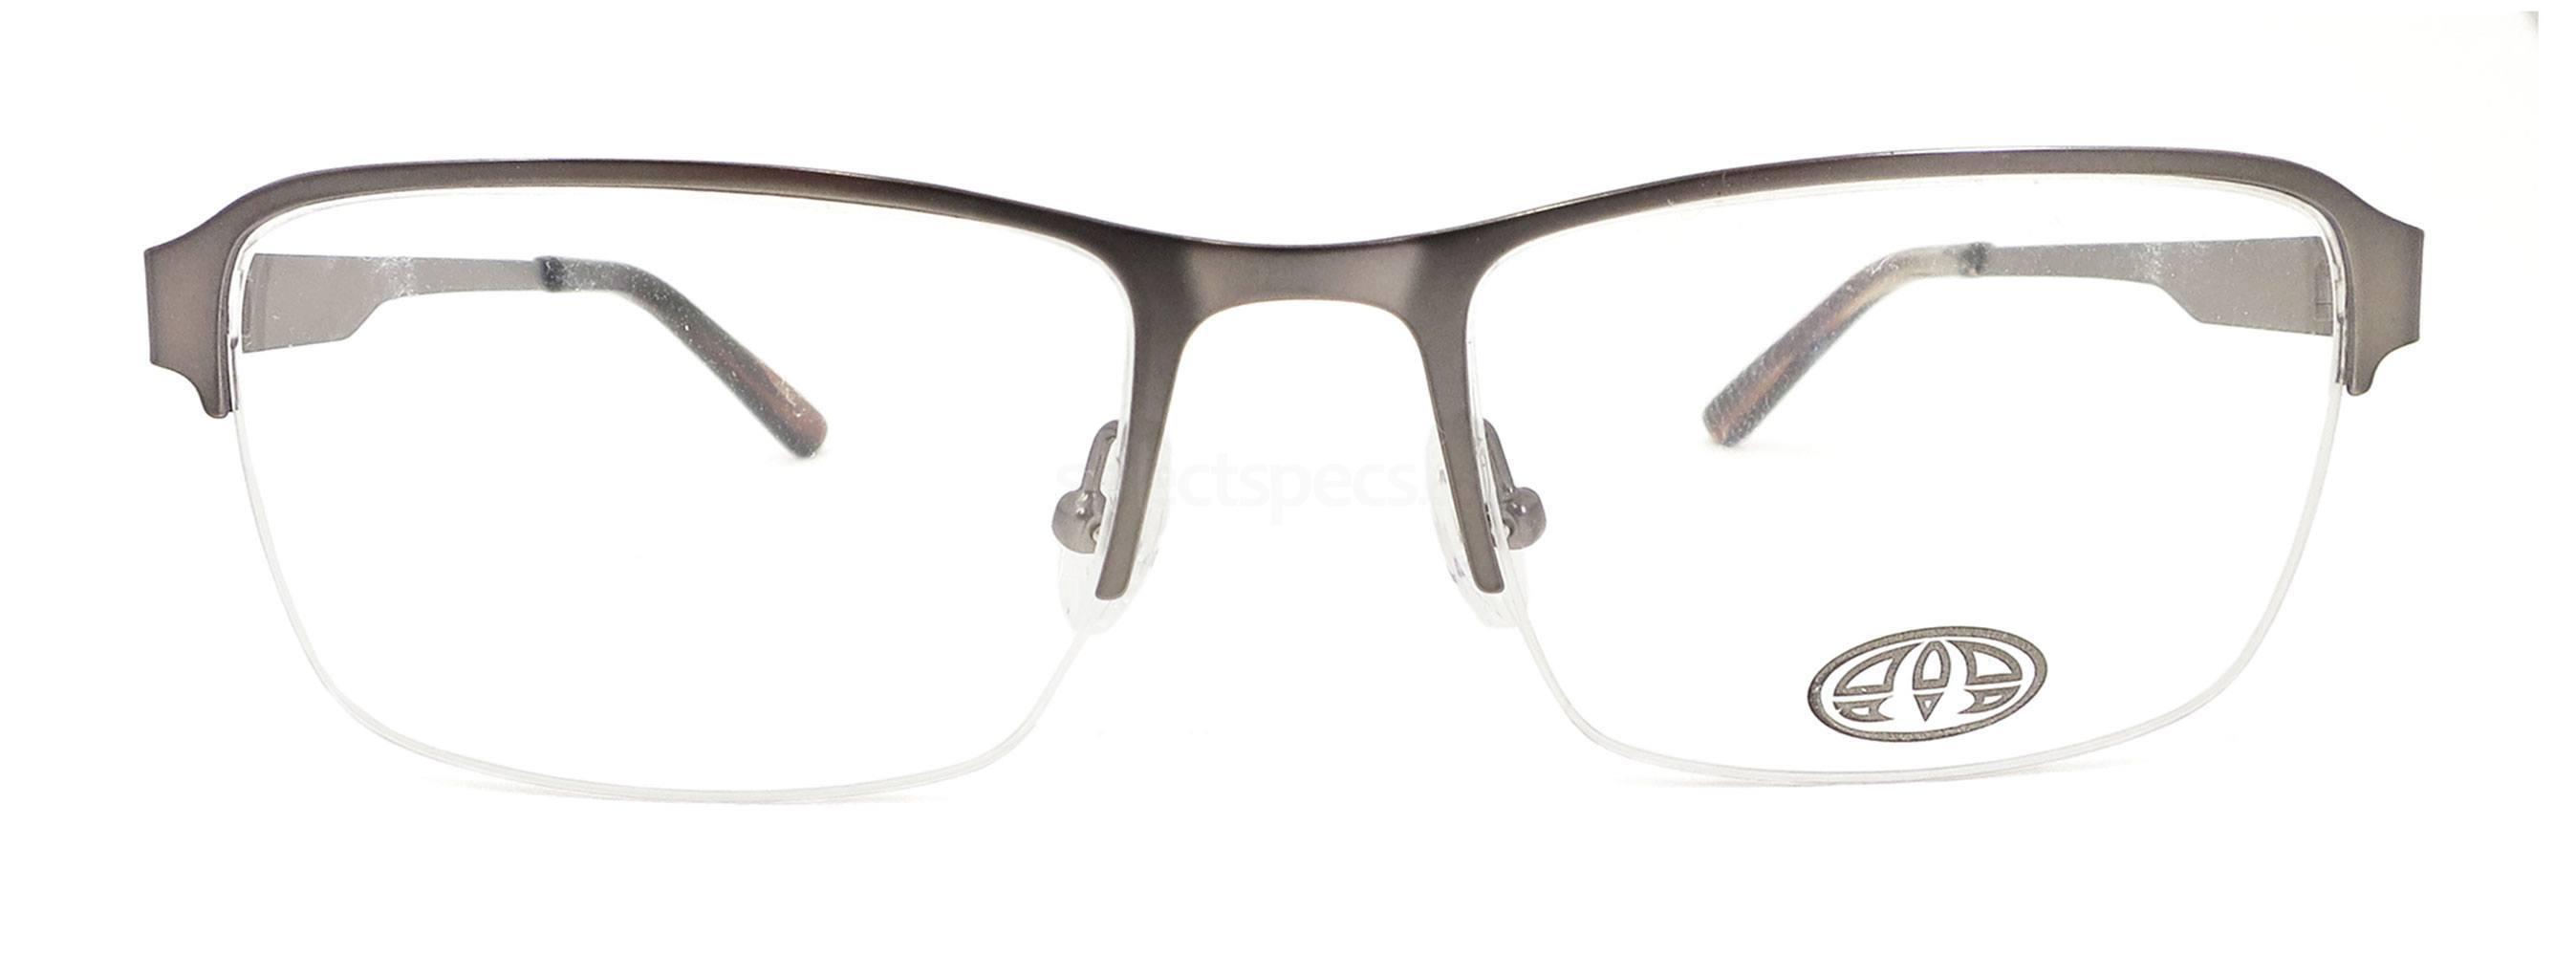 DGUN ANIS014 - JESSE Glasses, Animal